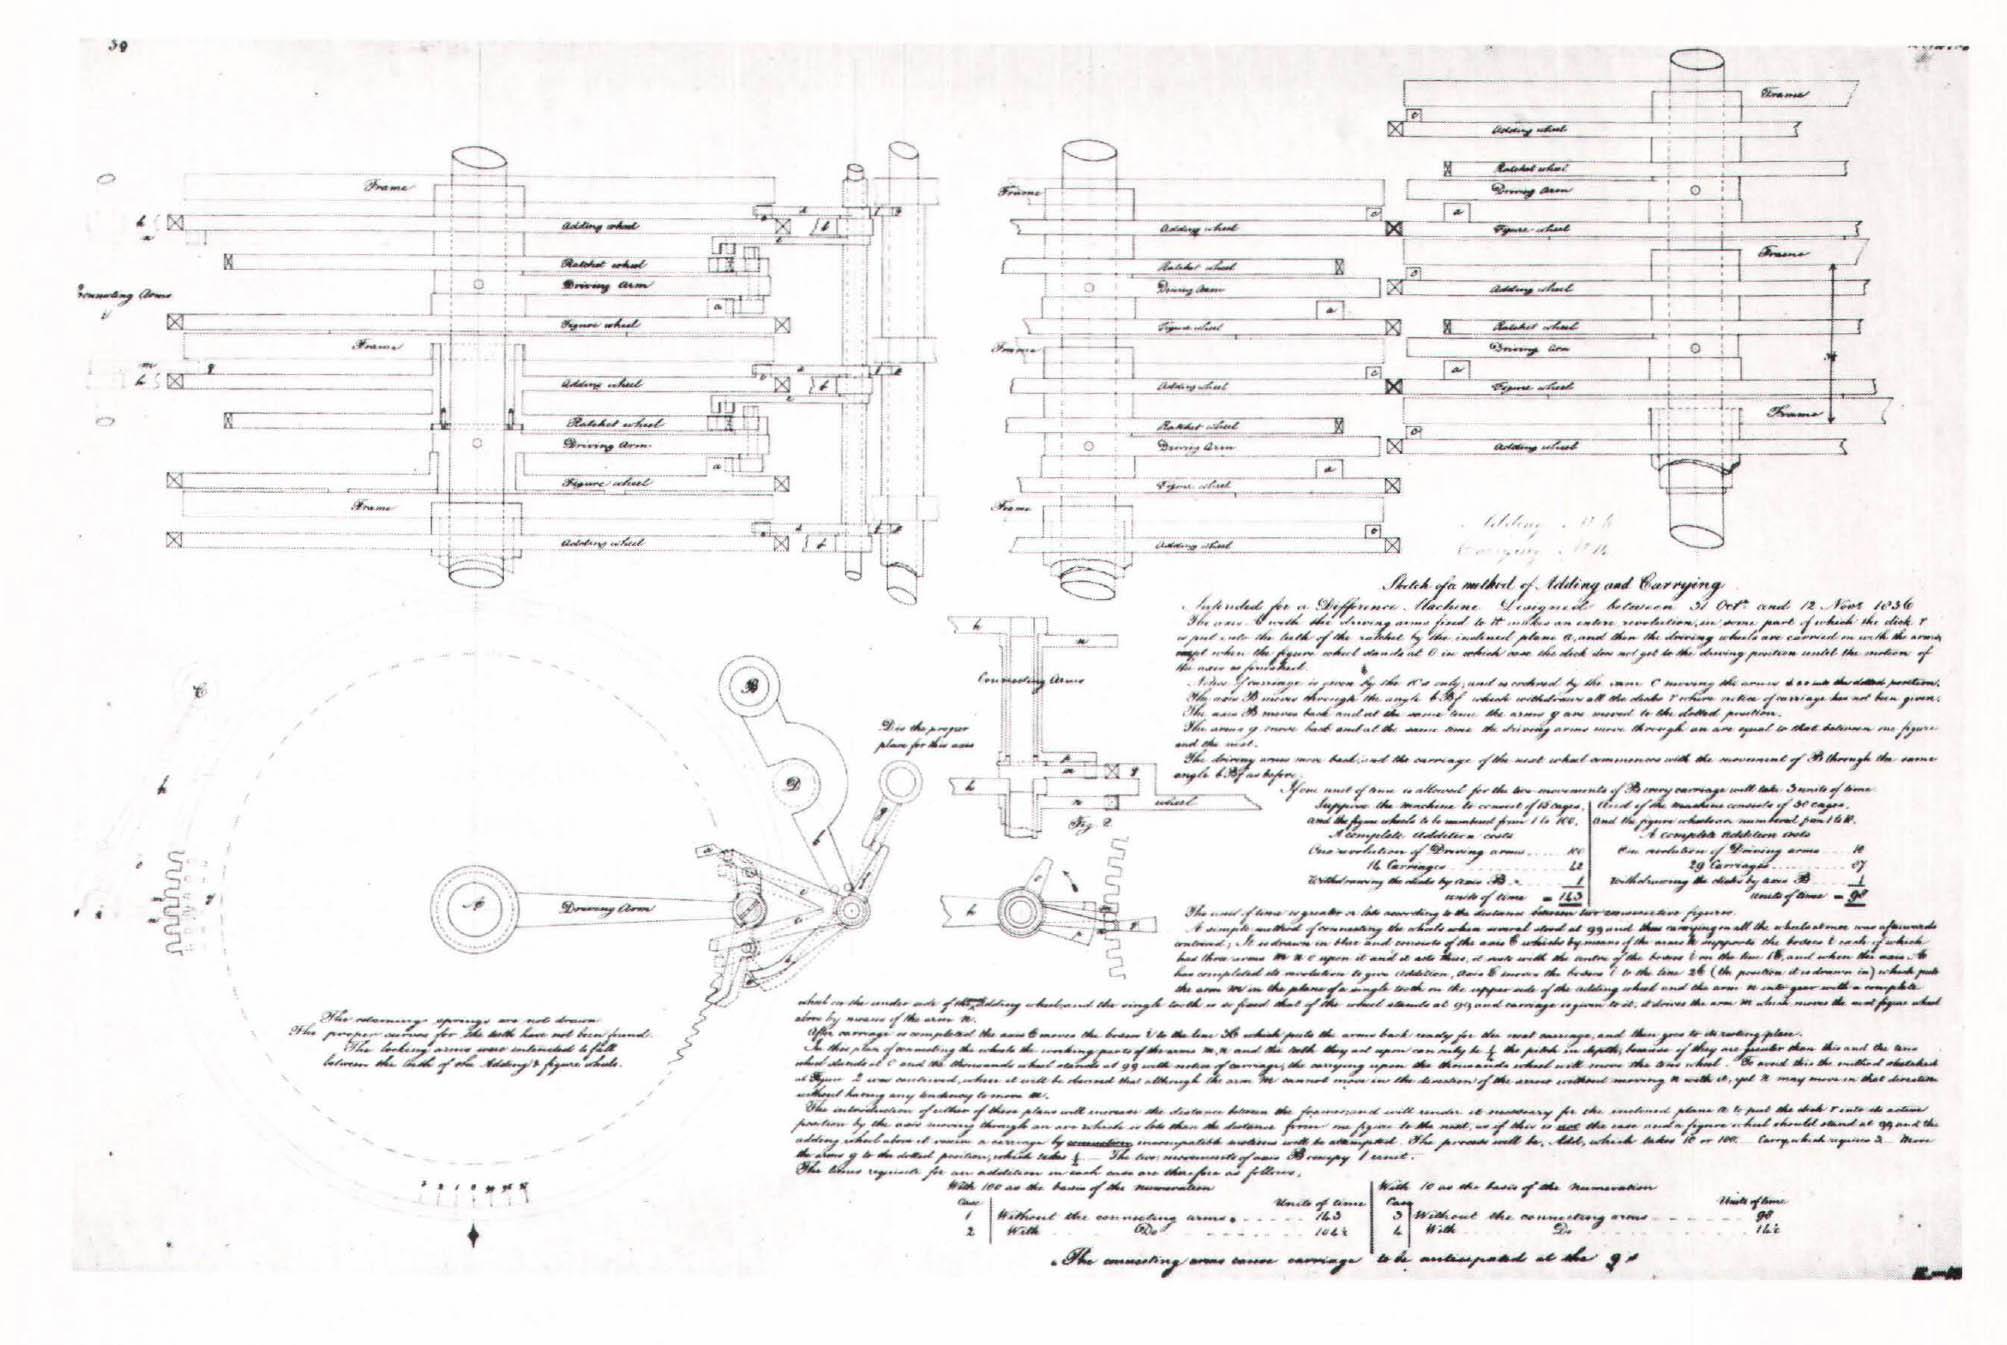 24 The Difference Engine – Difference Engine Diagram